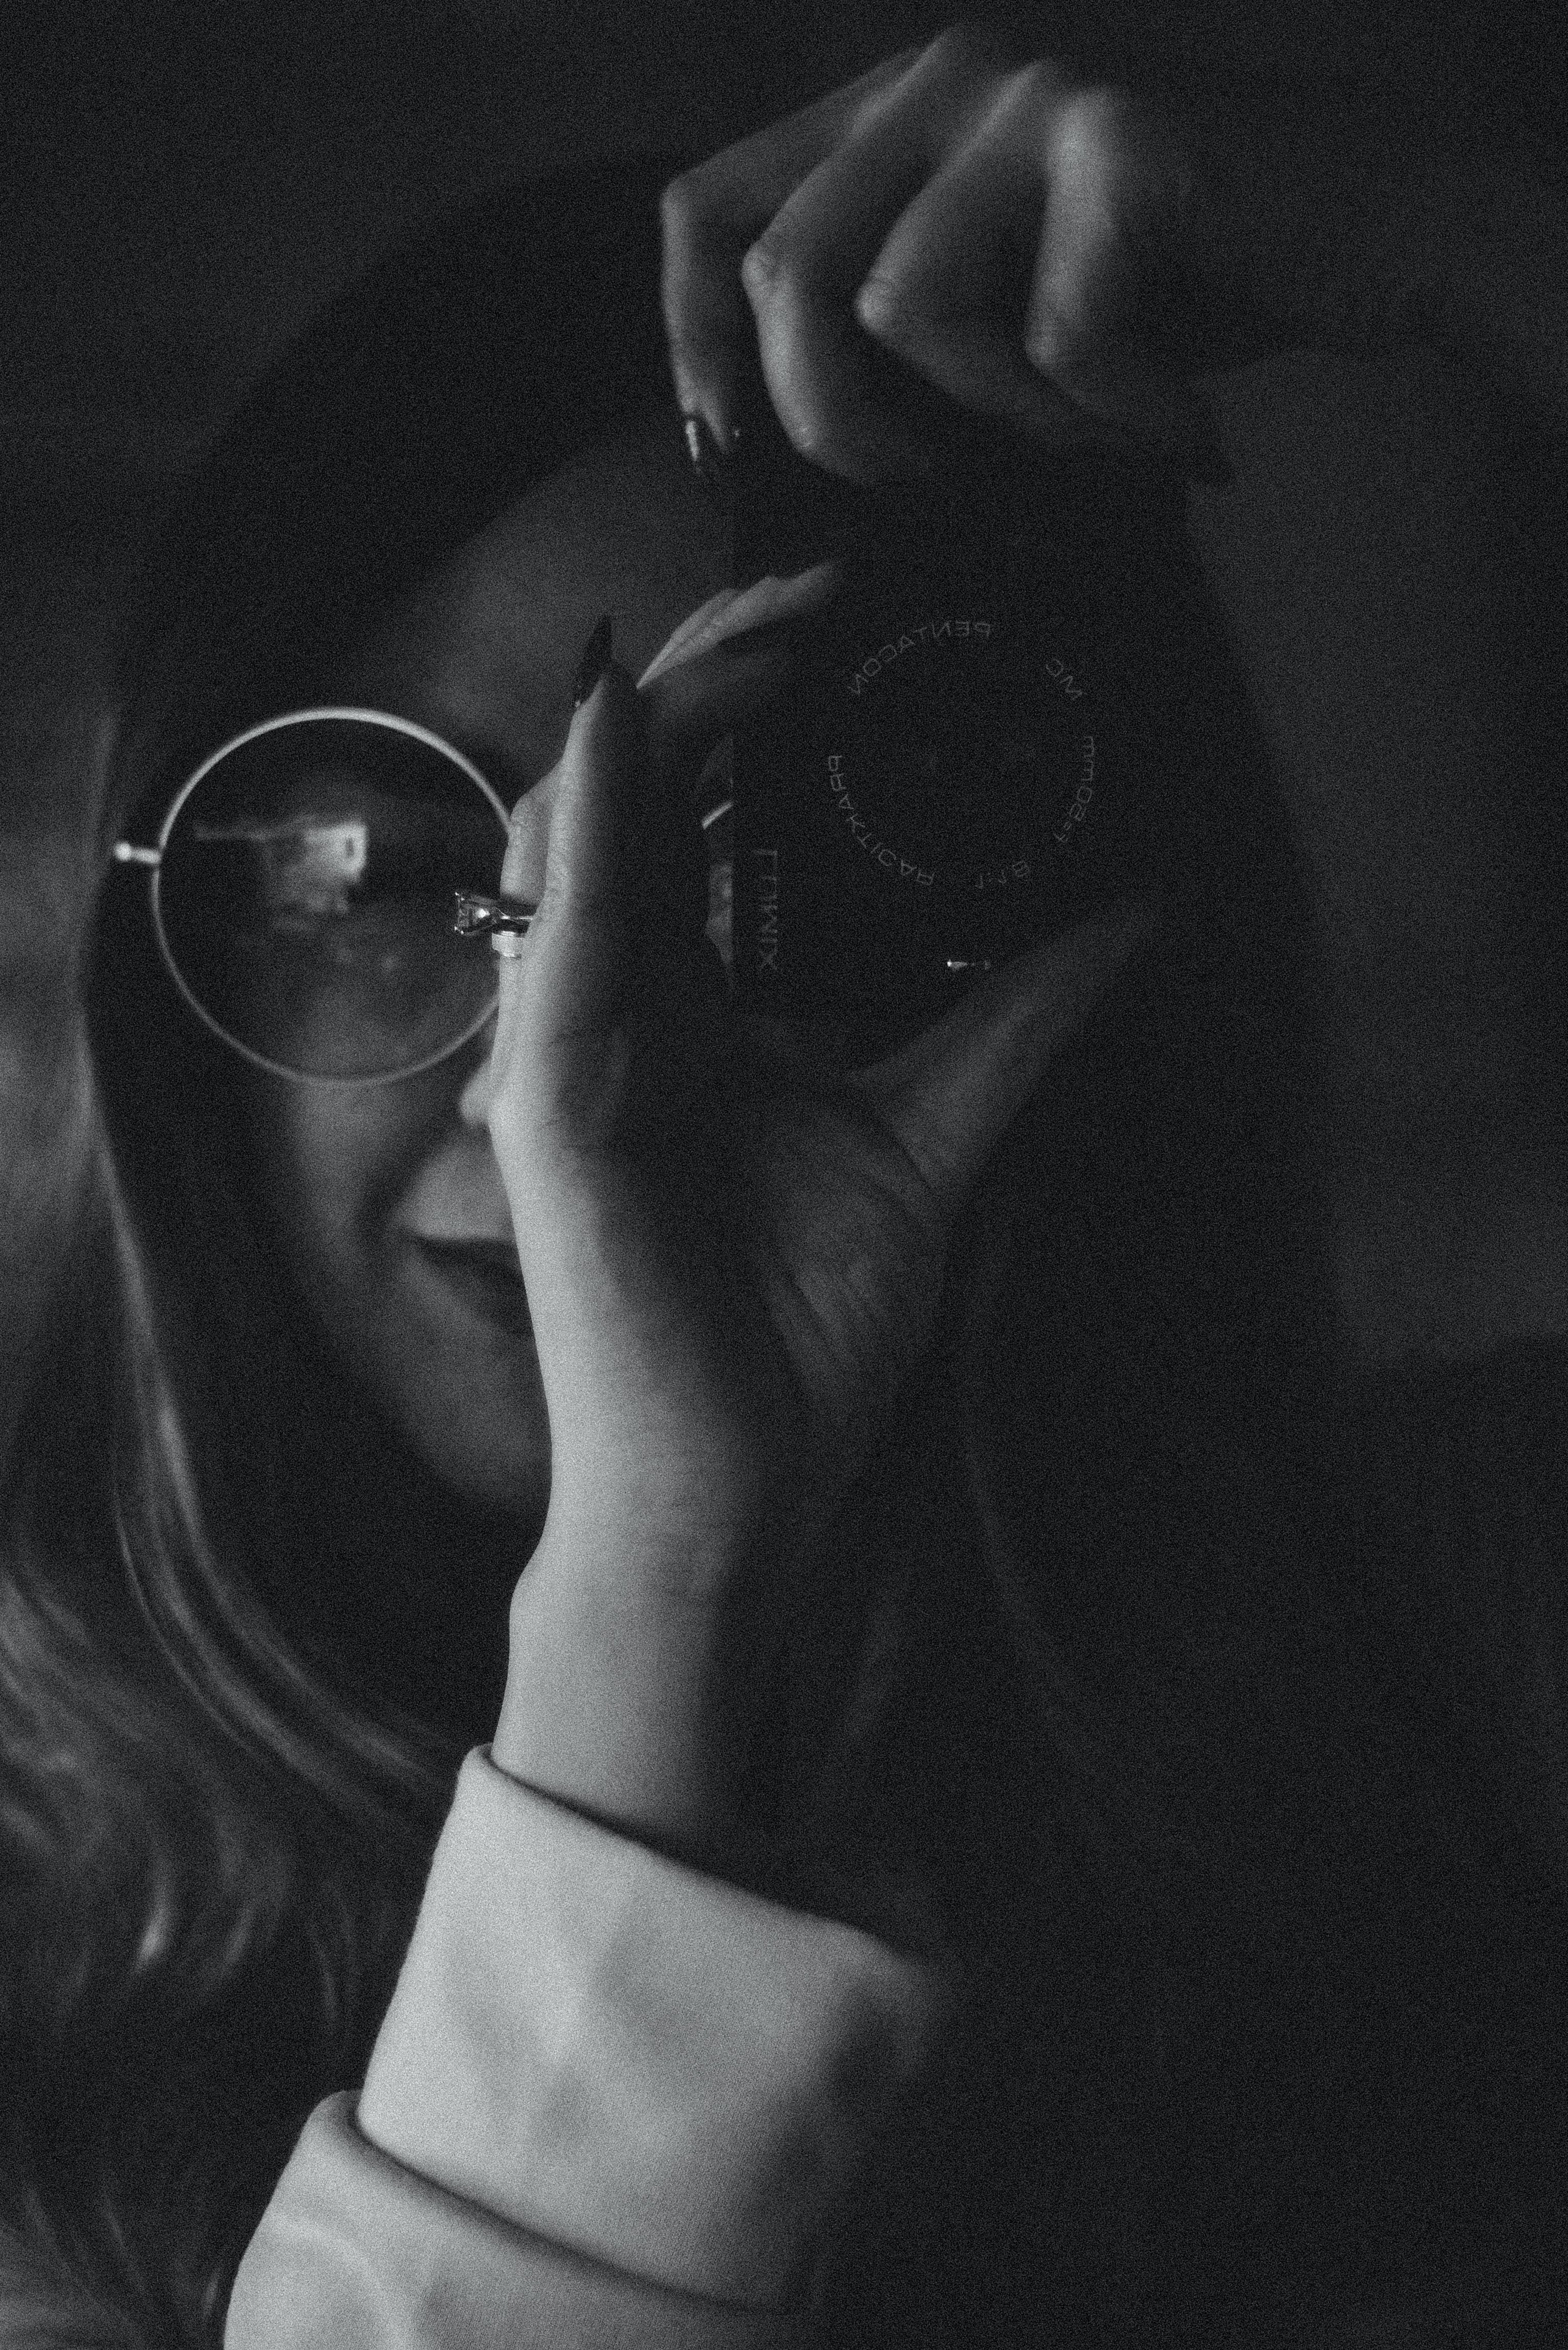 Monochrome Photo of Woman Using Camera